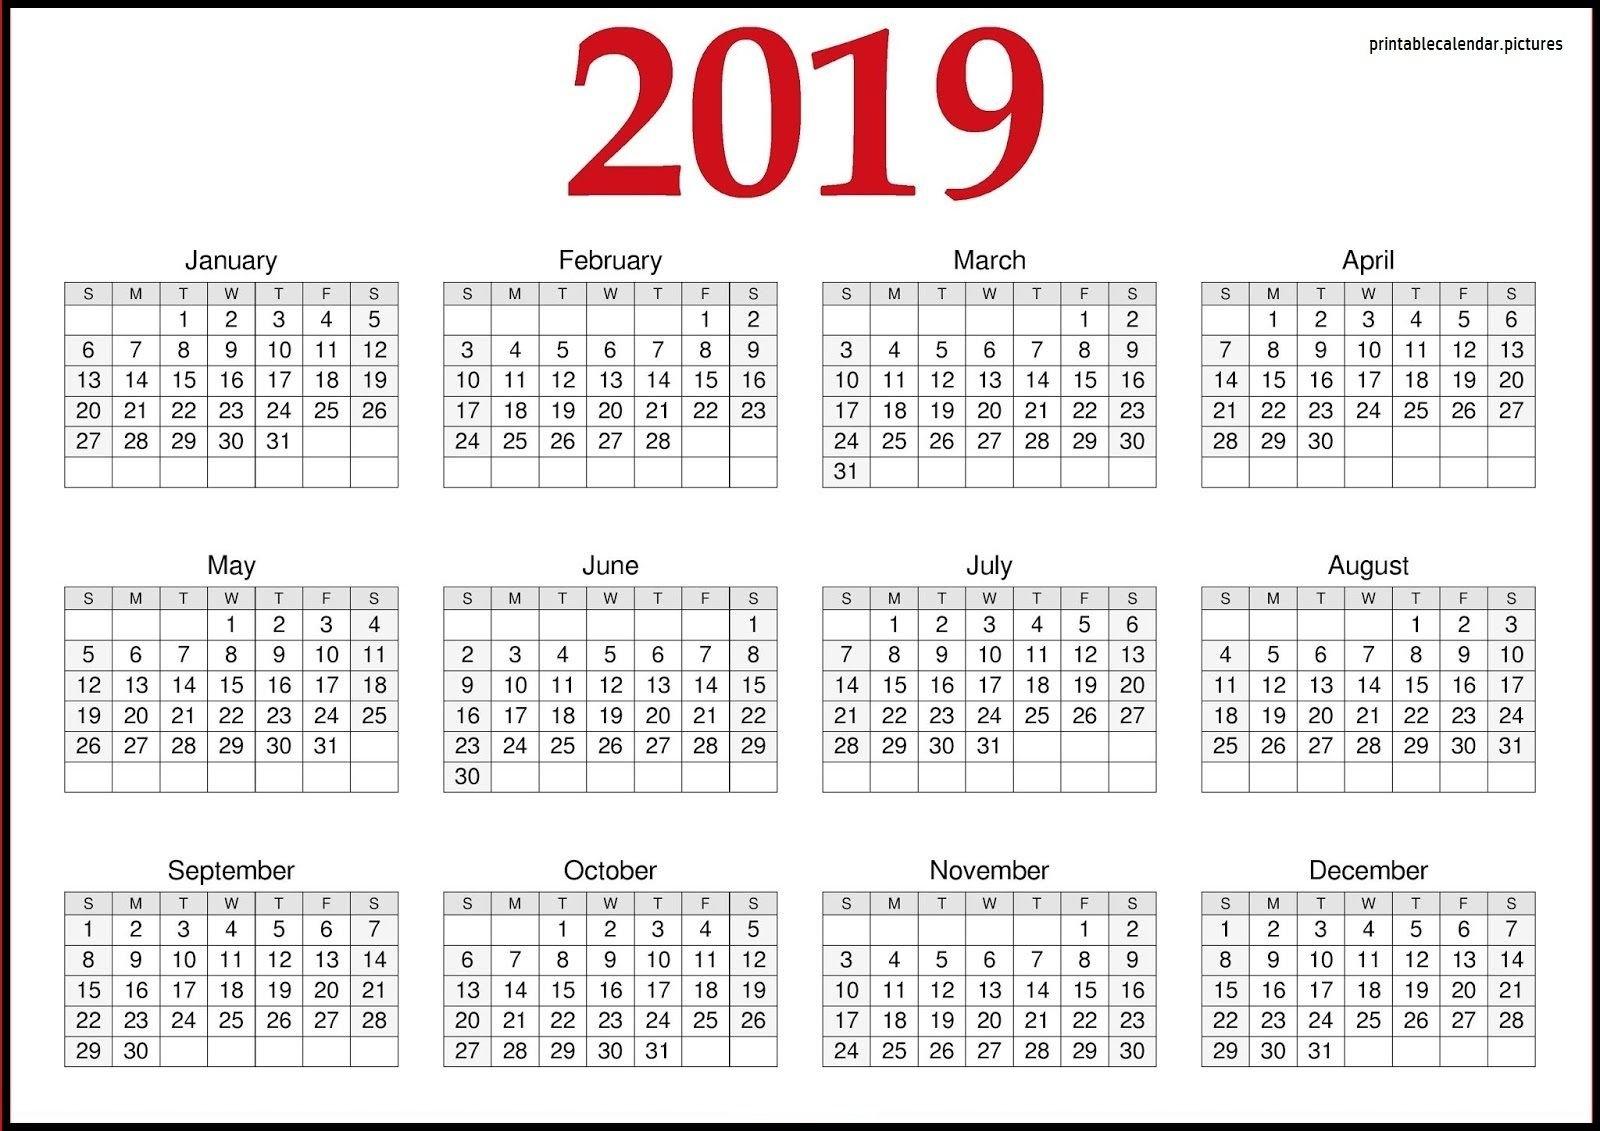 2019 Calendar Printable Word, Excel, Pdf, And Template | Printable Calendar 2019 Pdf